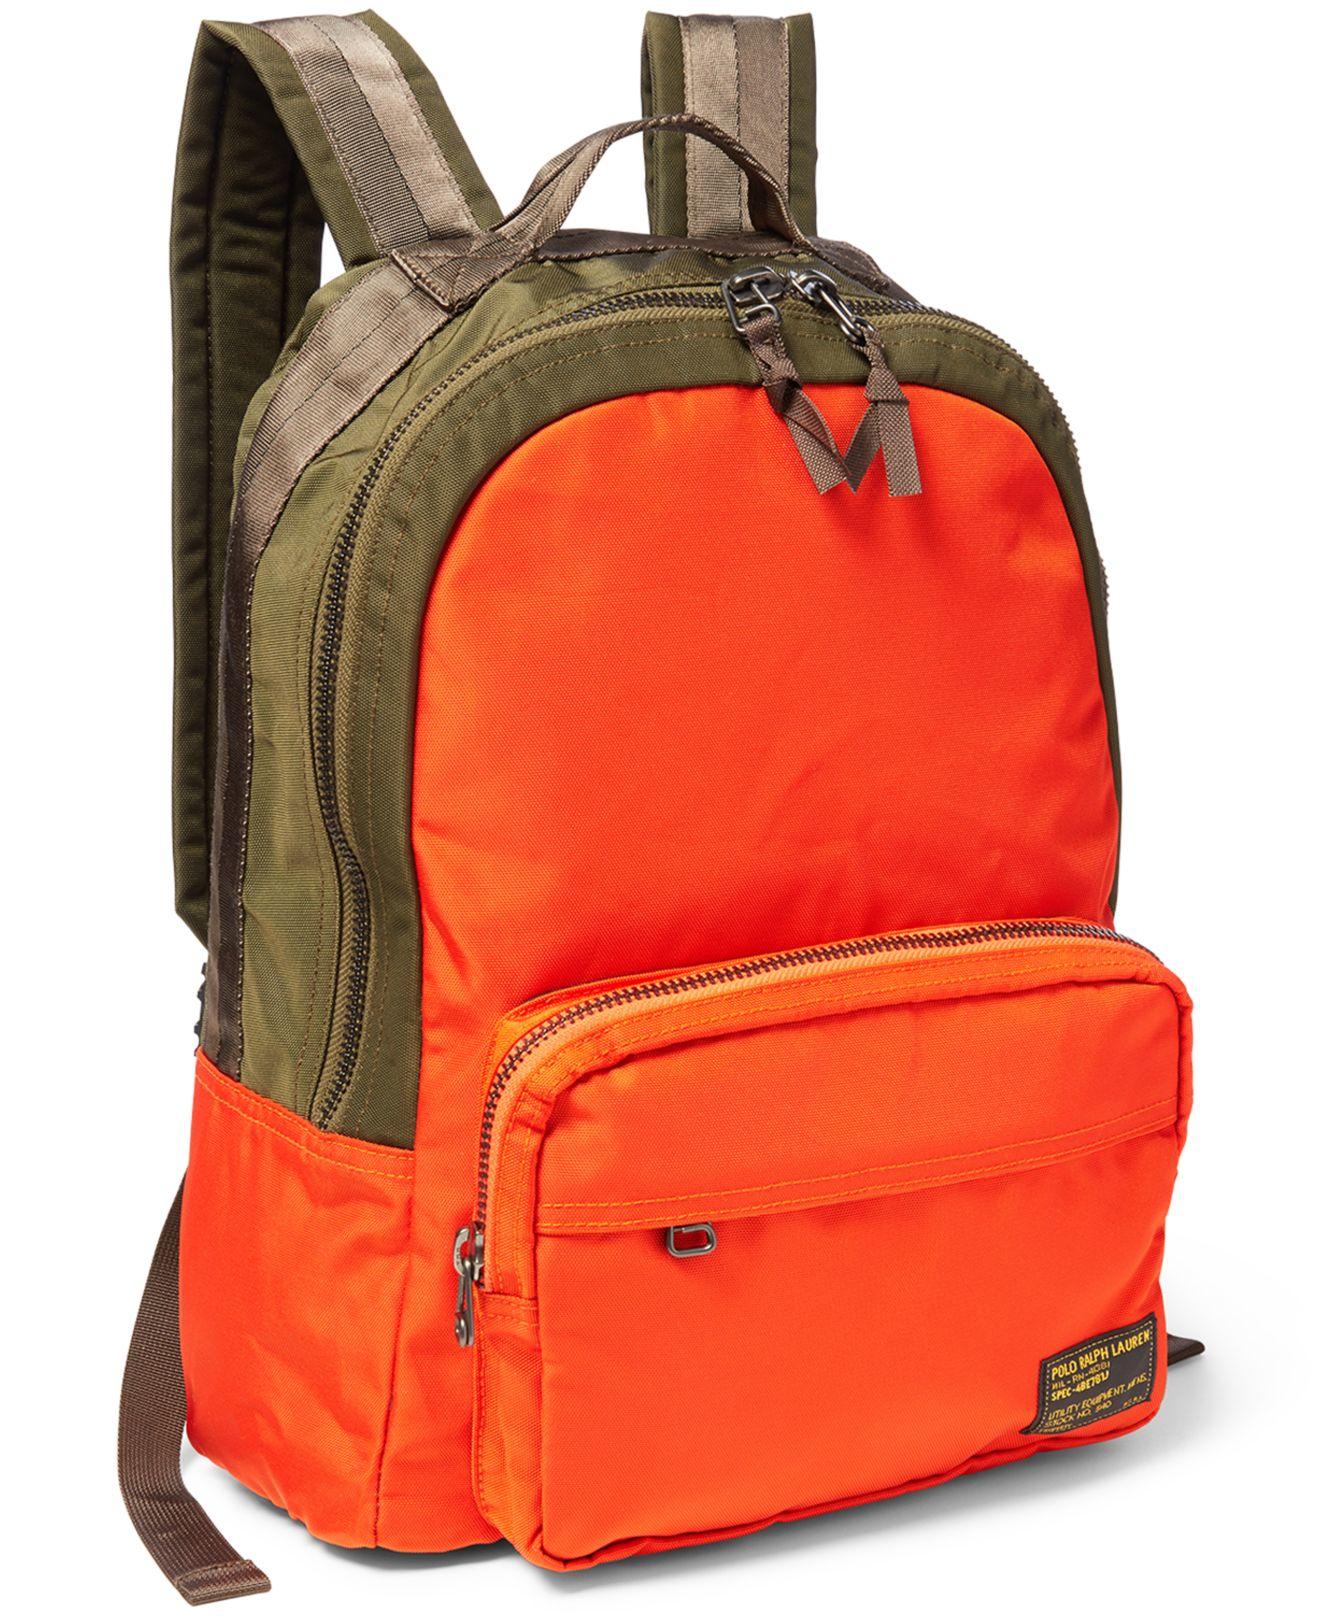 52d281ecd13 Lyst - Polo Ralph Lauren Camo-print Military Backpack in Orange for Men